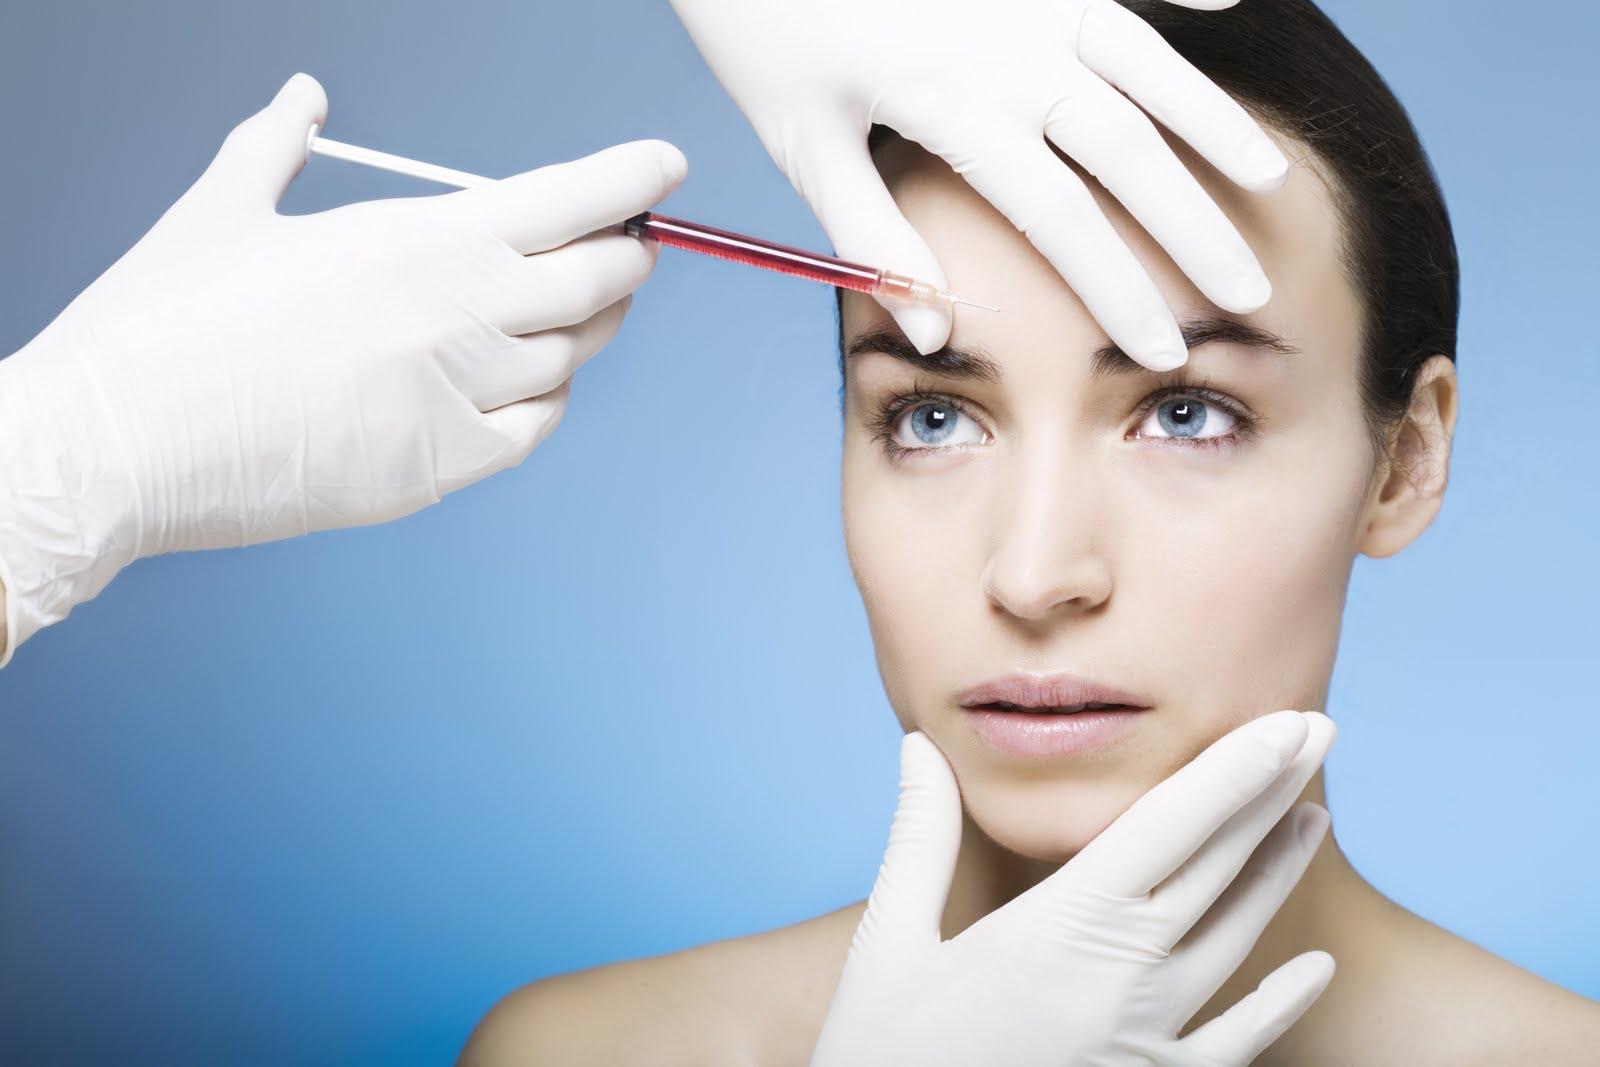 Phẫu thuật thẩm mỹ căng da mặt